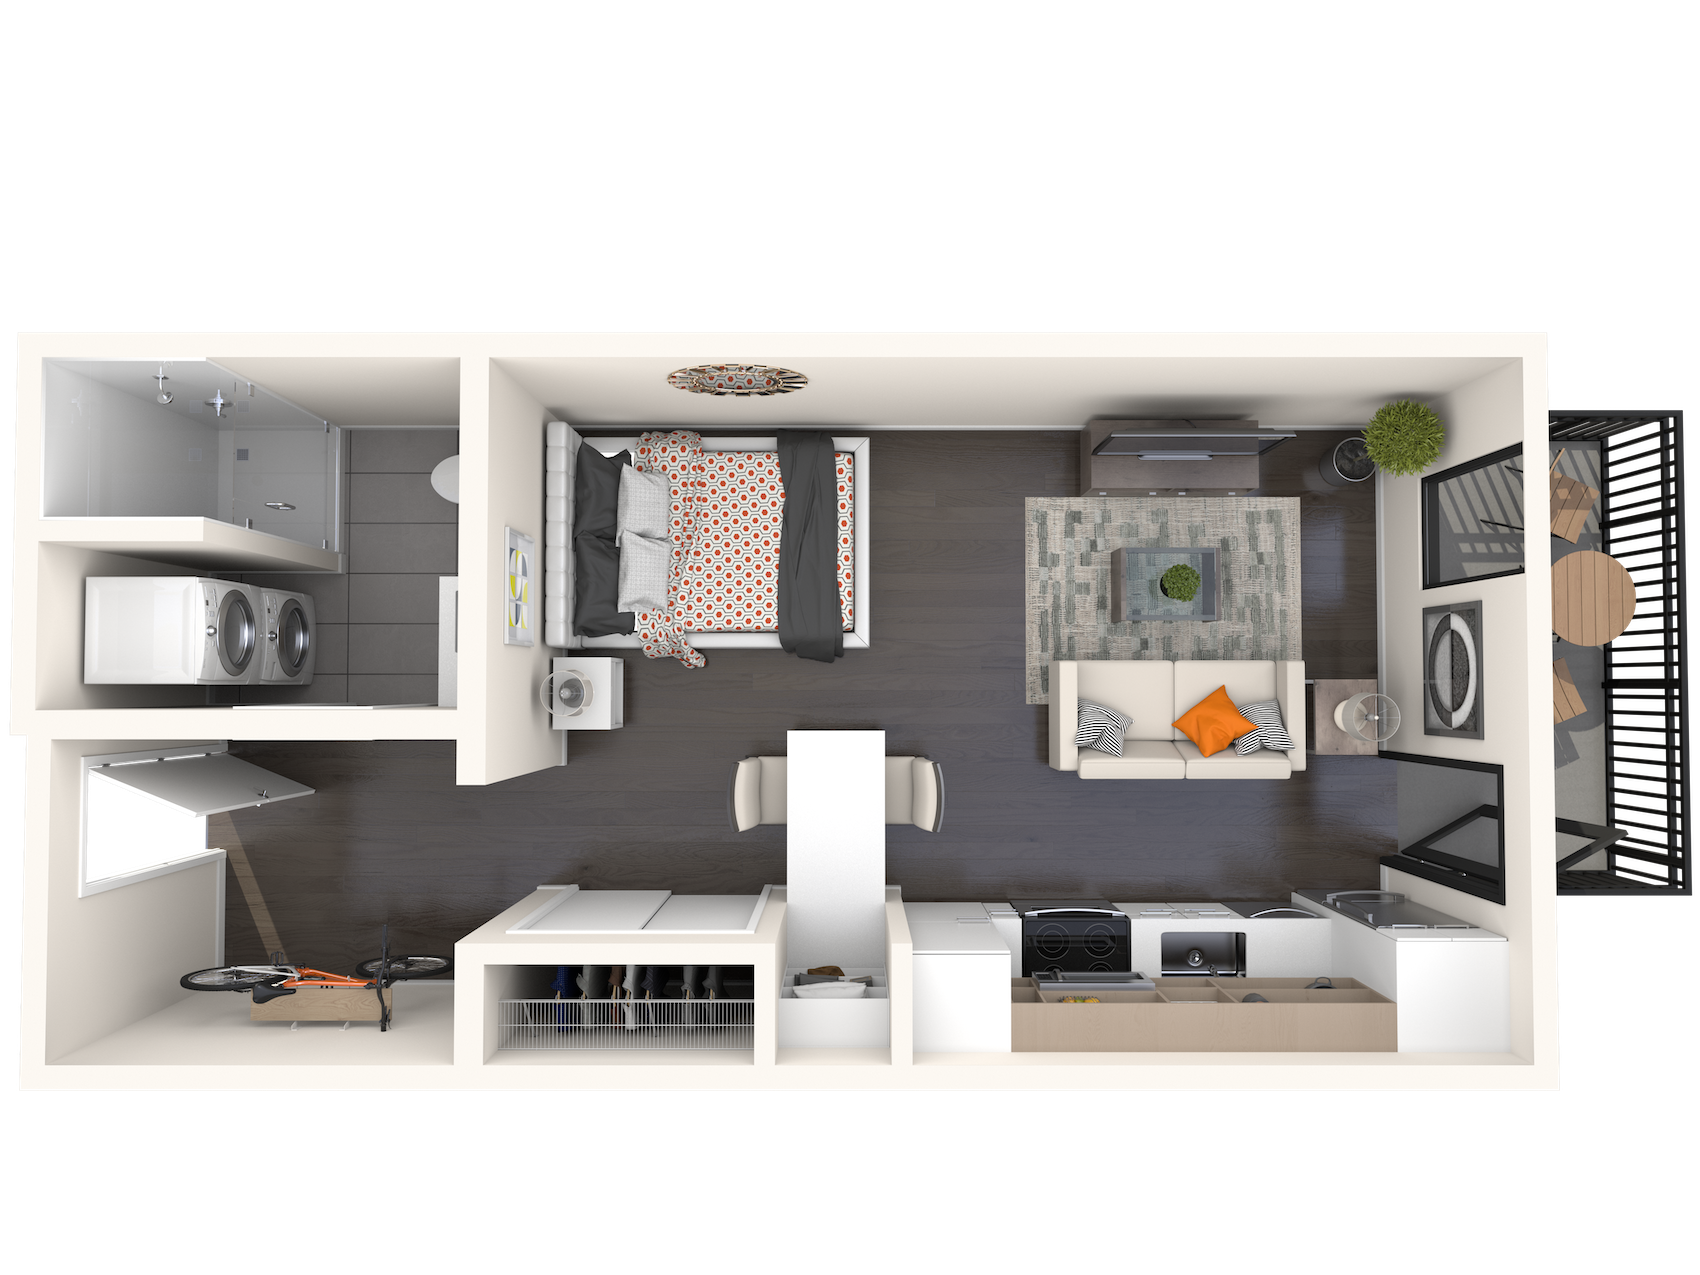 B0.3 Floor Plan